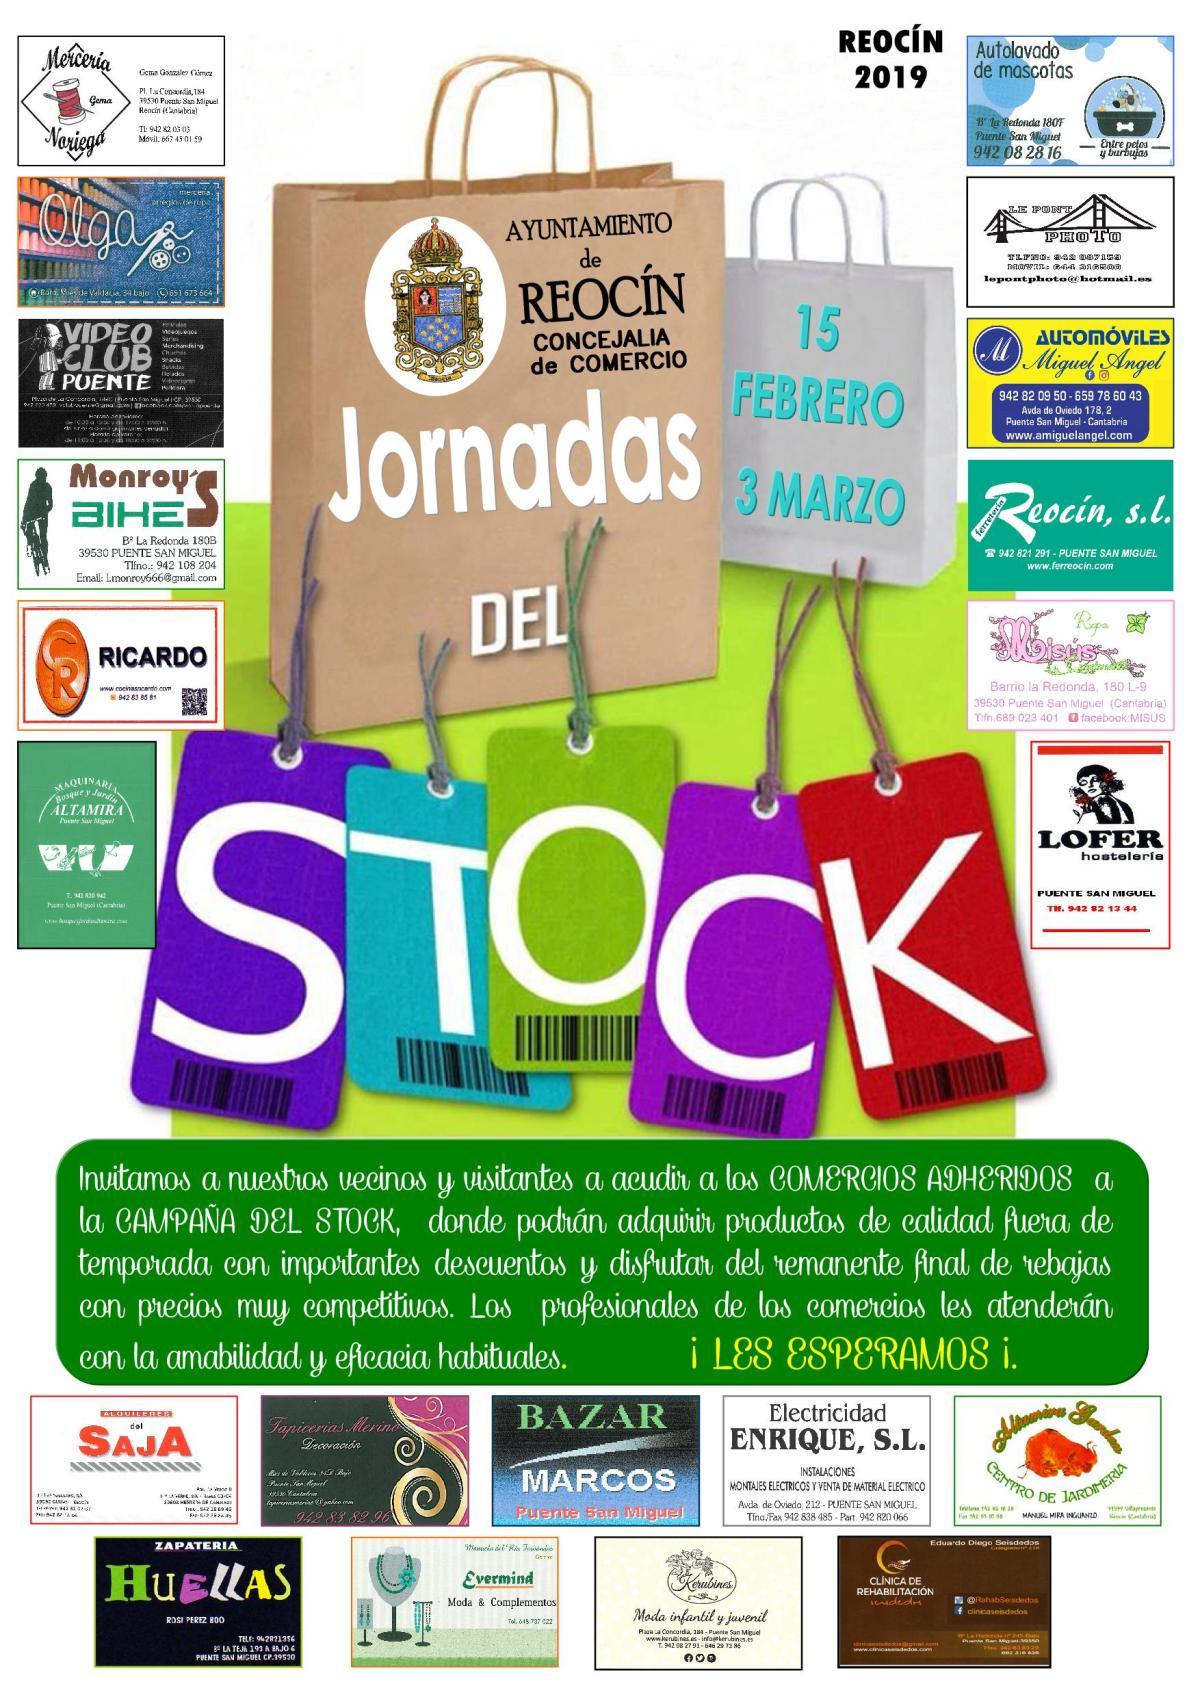 cartel jornadas del stock 2019